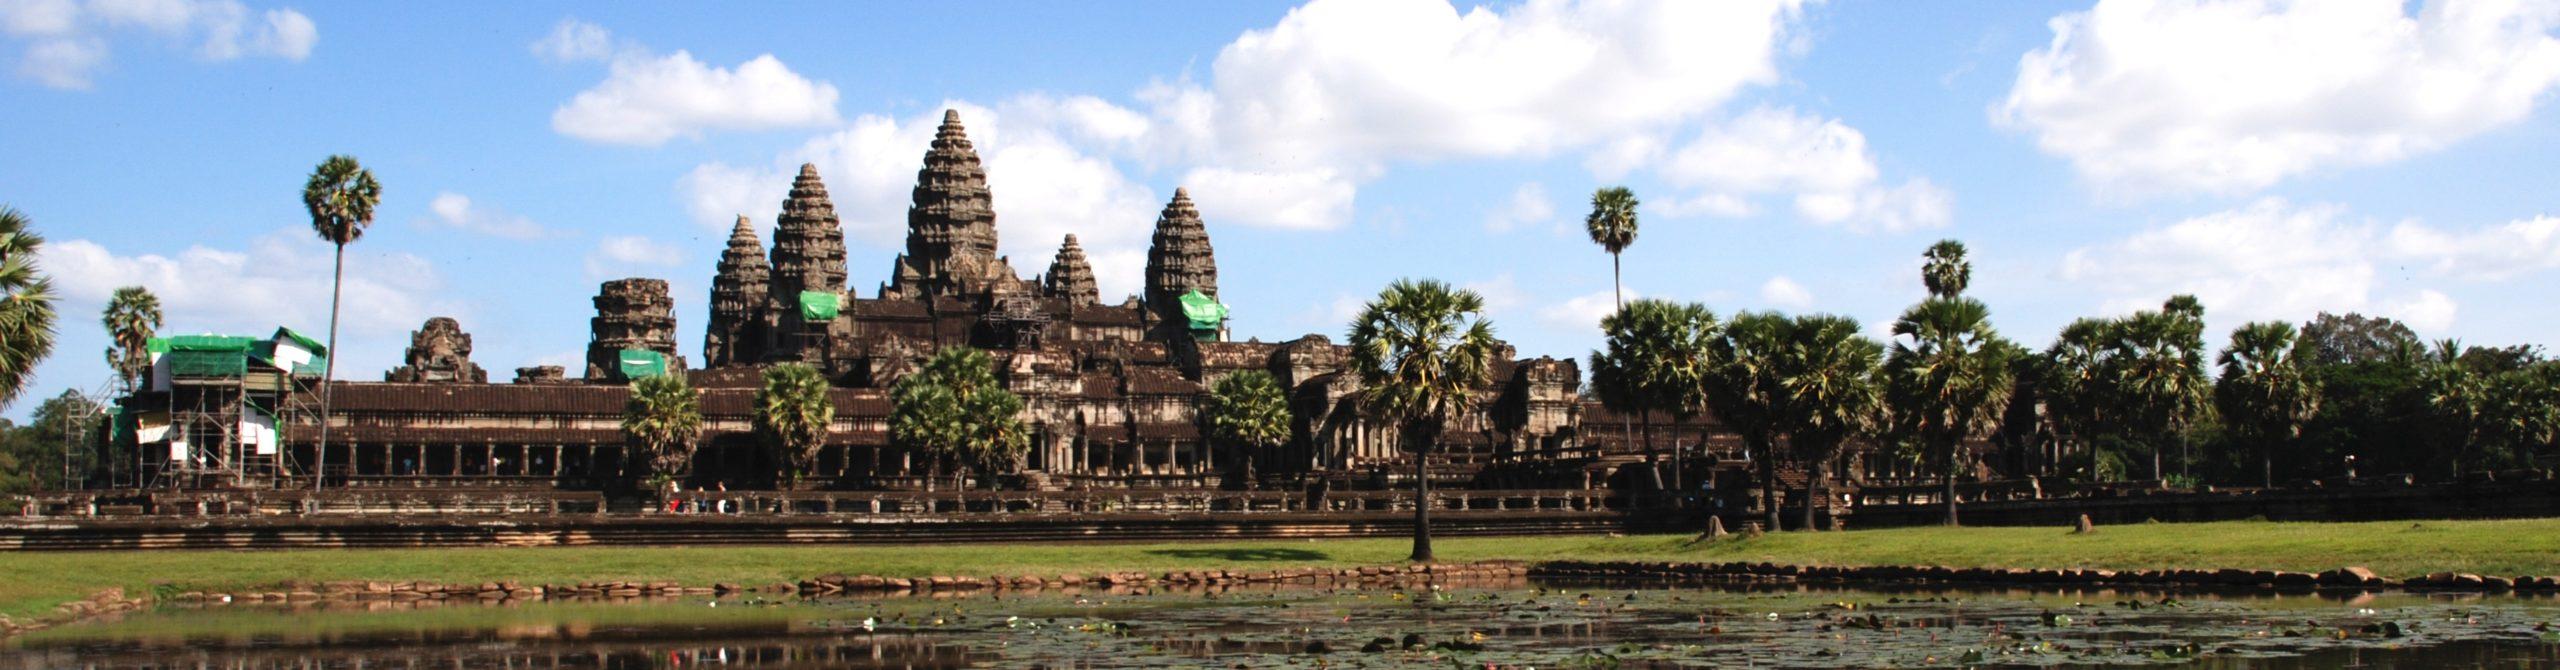 Angkor Wat Karte.Rundgänge Durch Die Angkor Wat Tempel Touren Karten